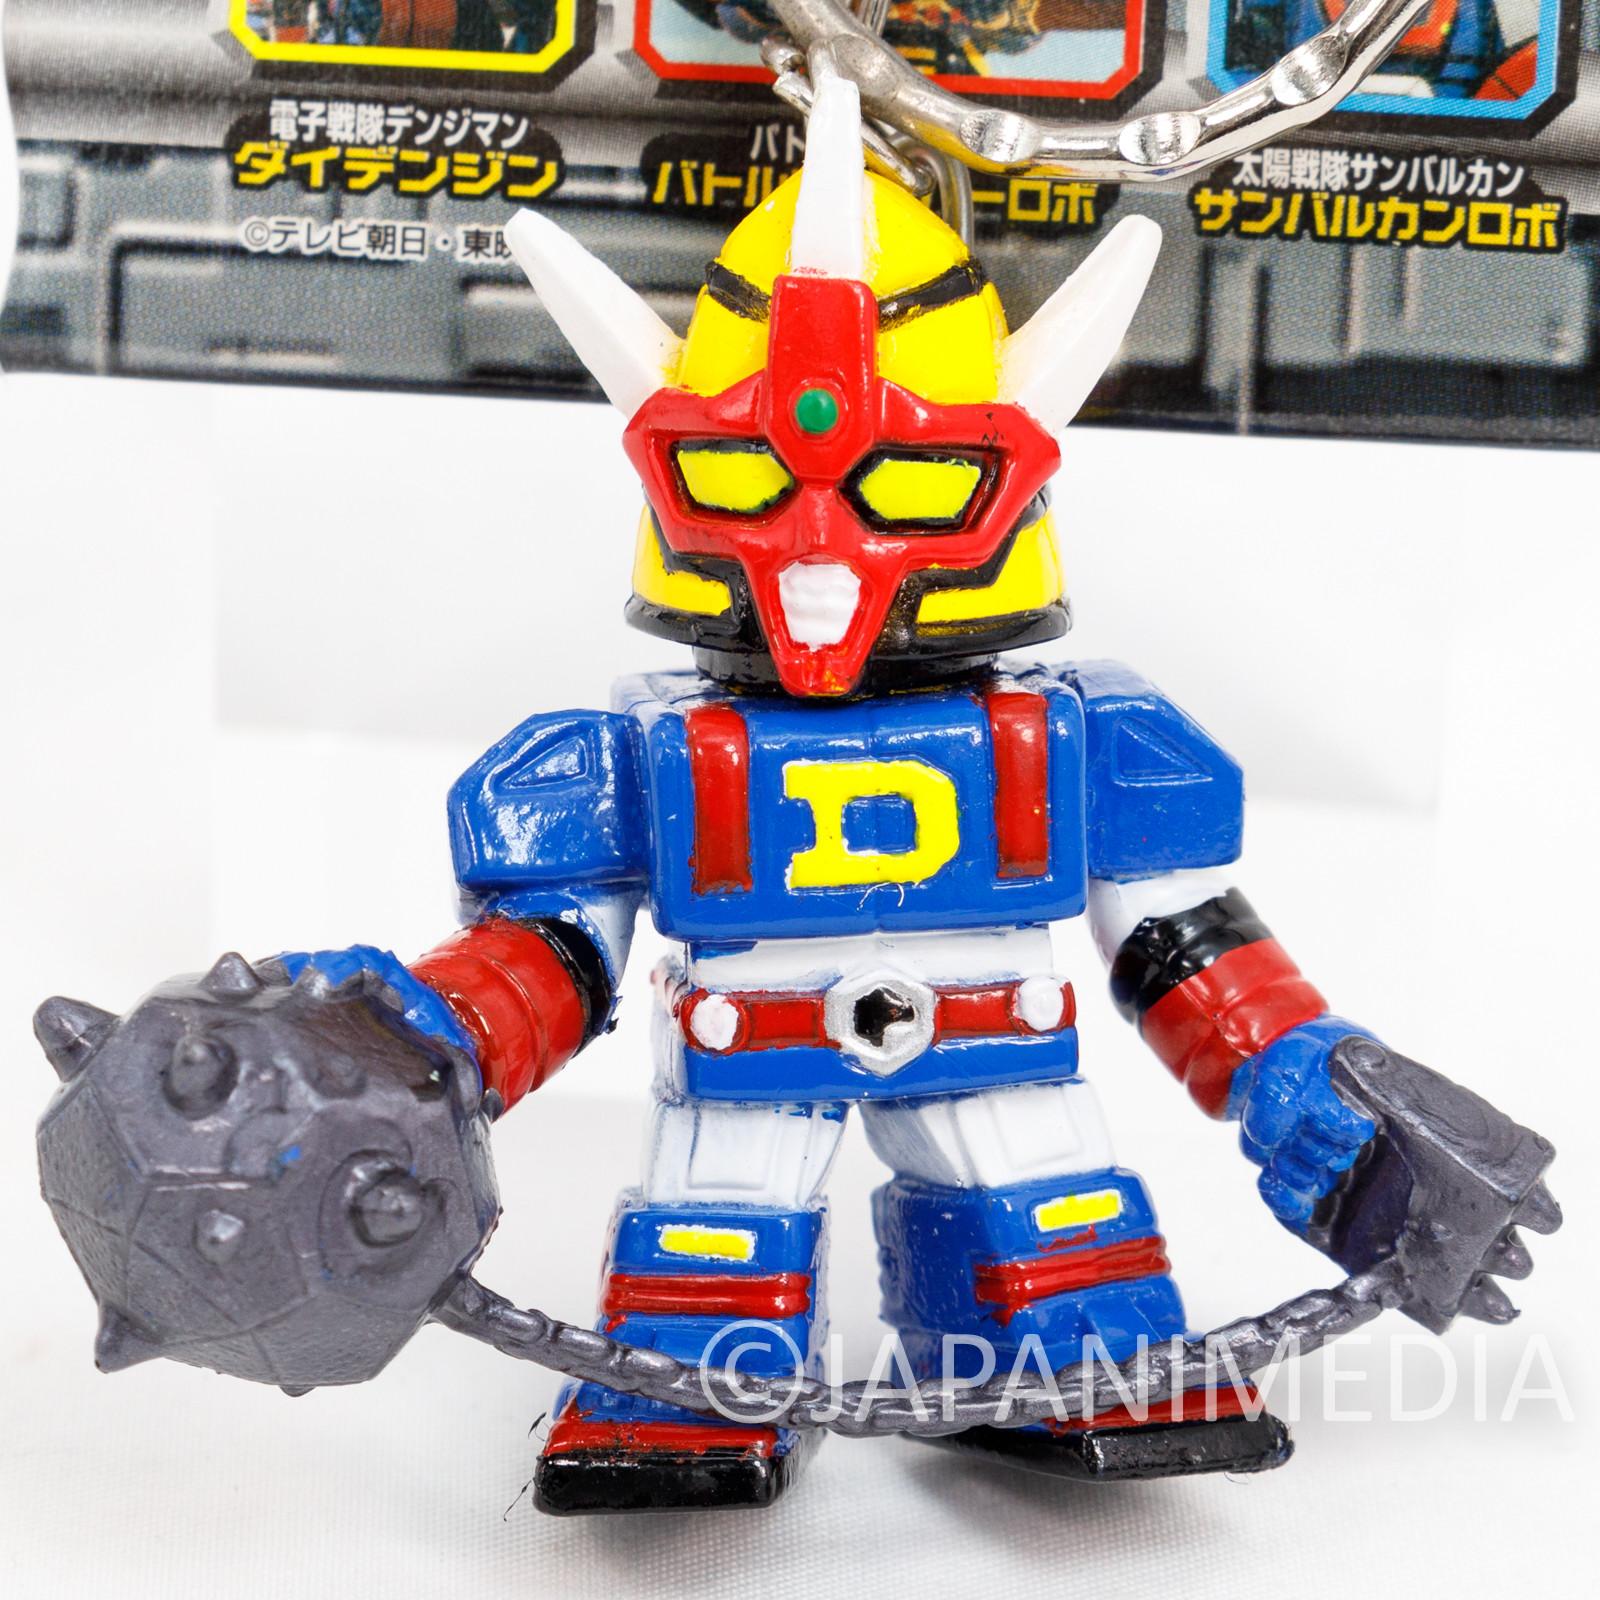 Denshi Sentai Denziman Daidenzin Figure Key Chain Banpresto TOKUSATSU